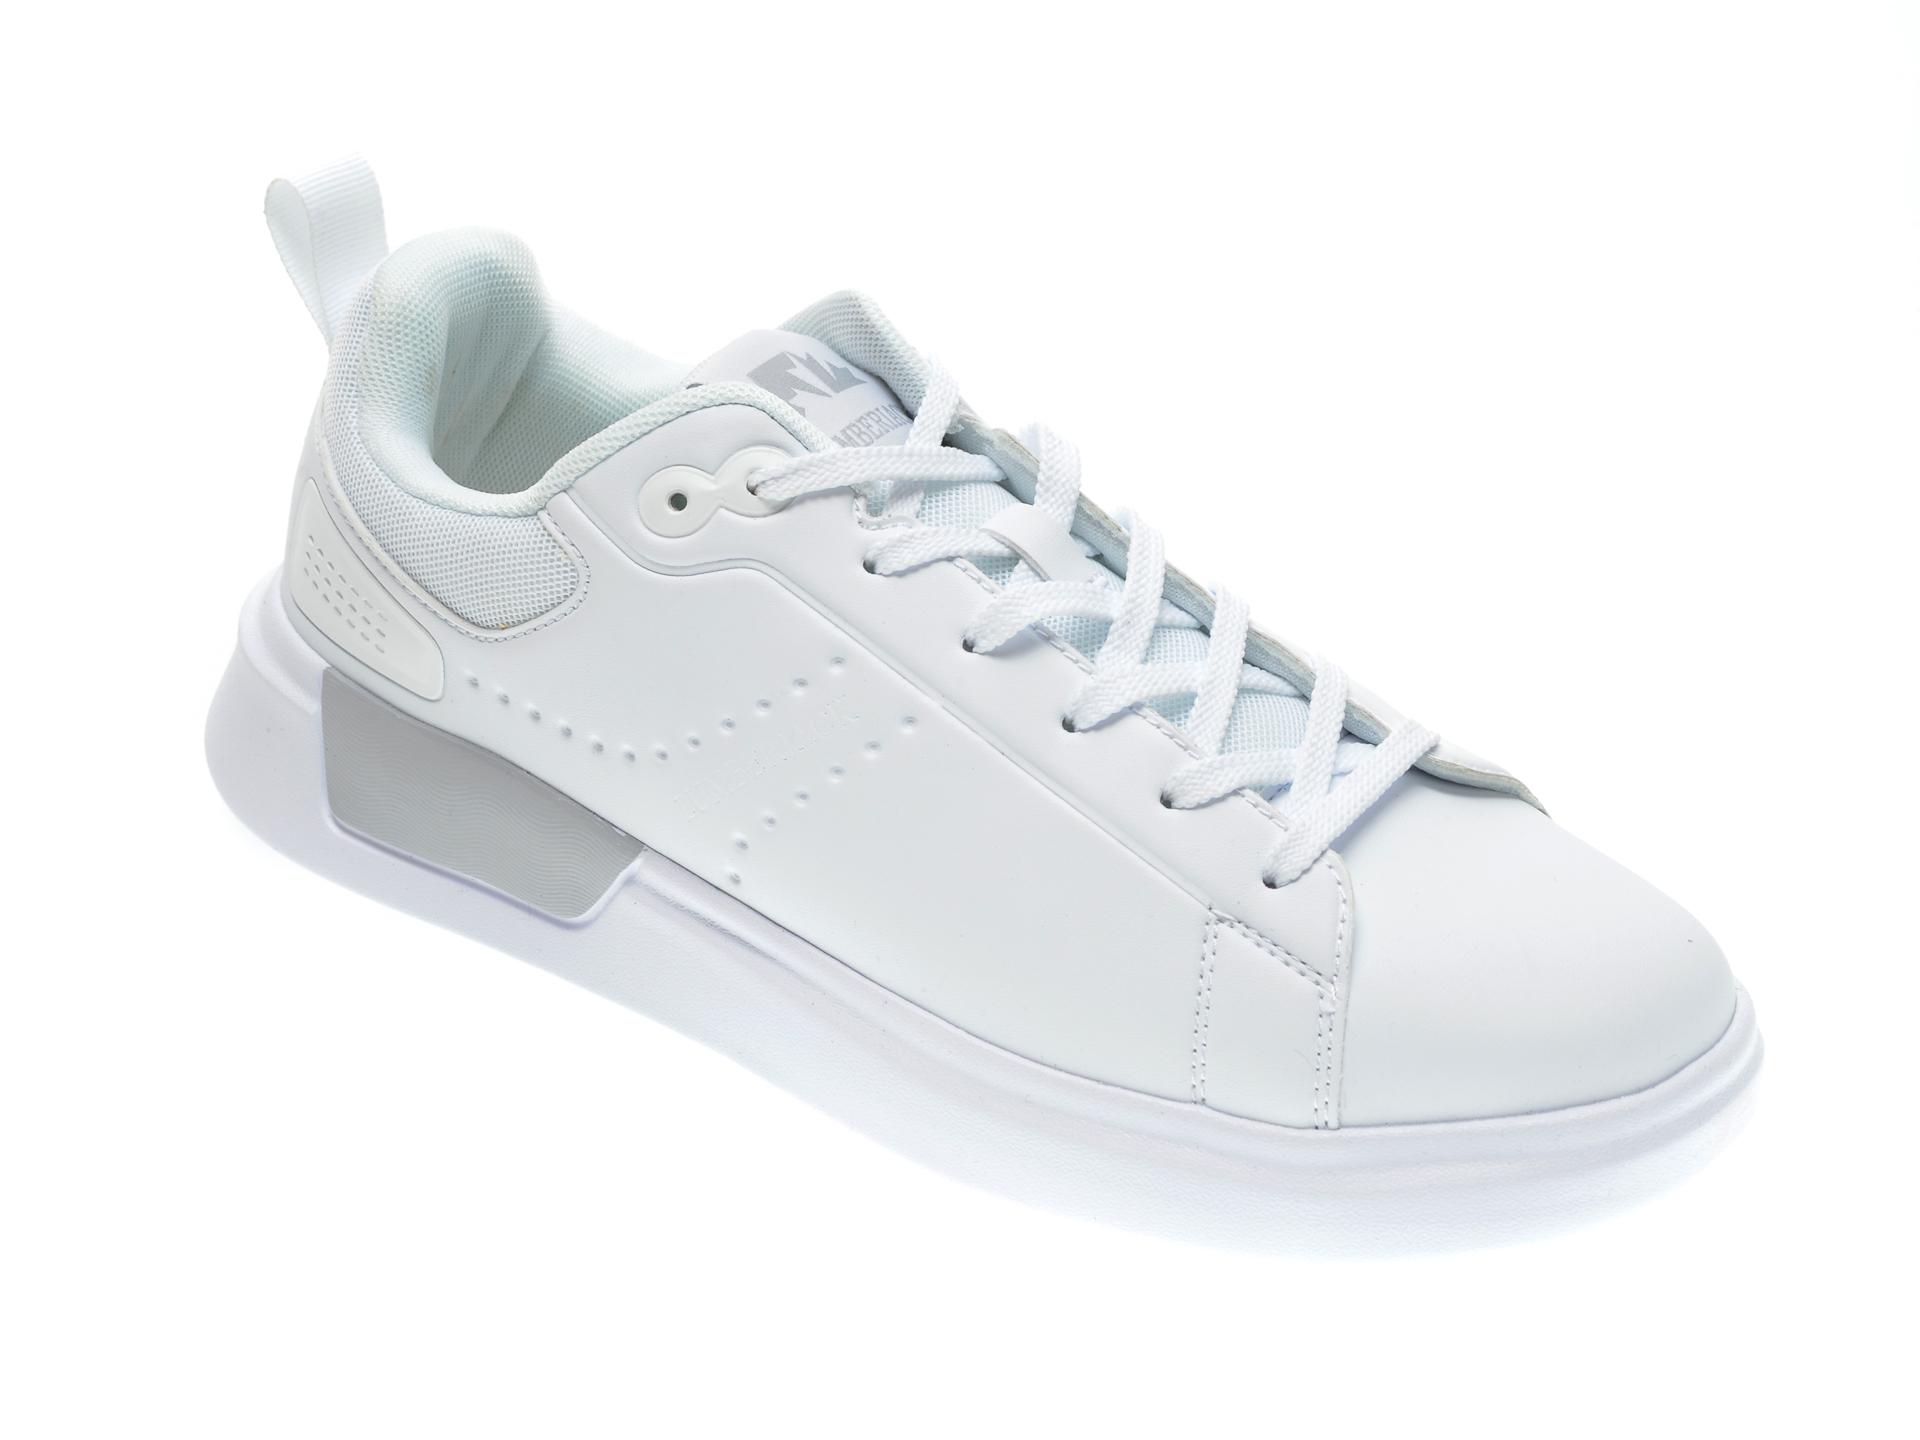 Pantofi sport LUMBERJACK albi, 711001, din piele ecologica imagine otter.ro 2021